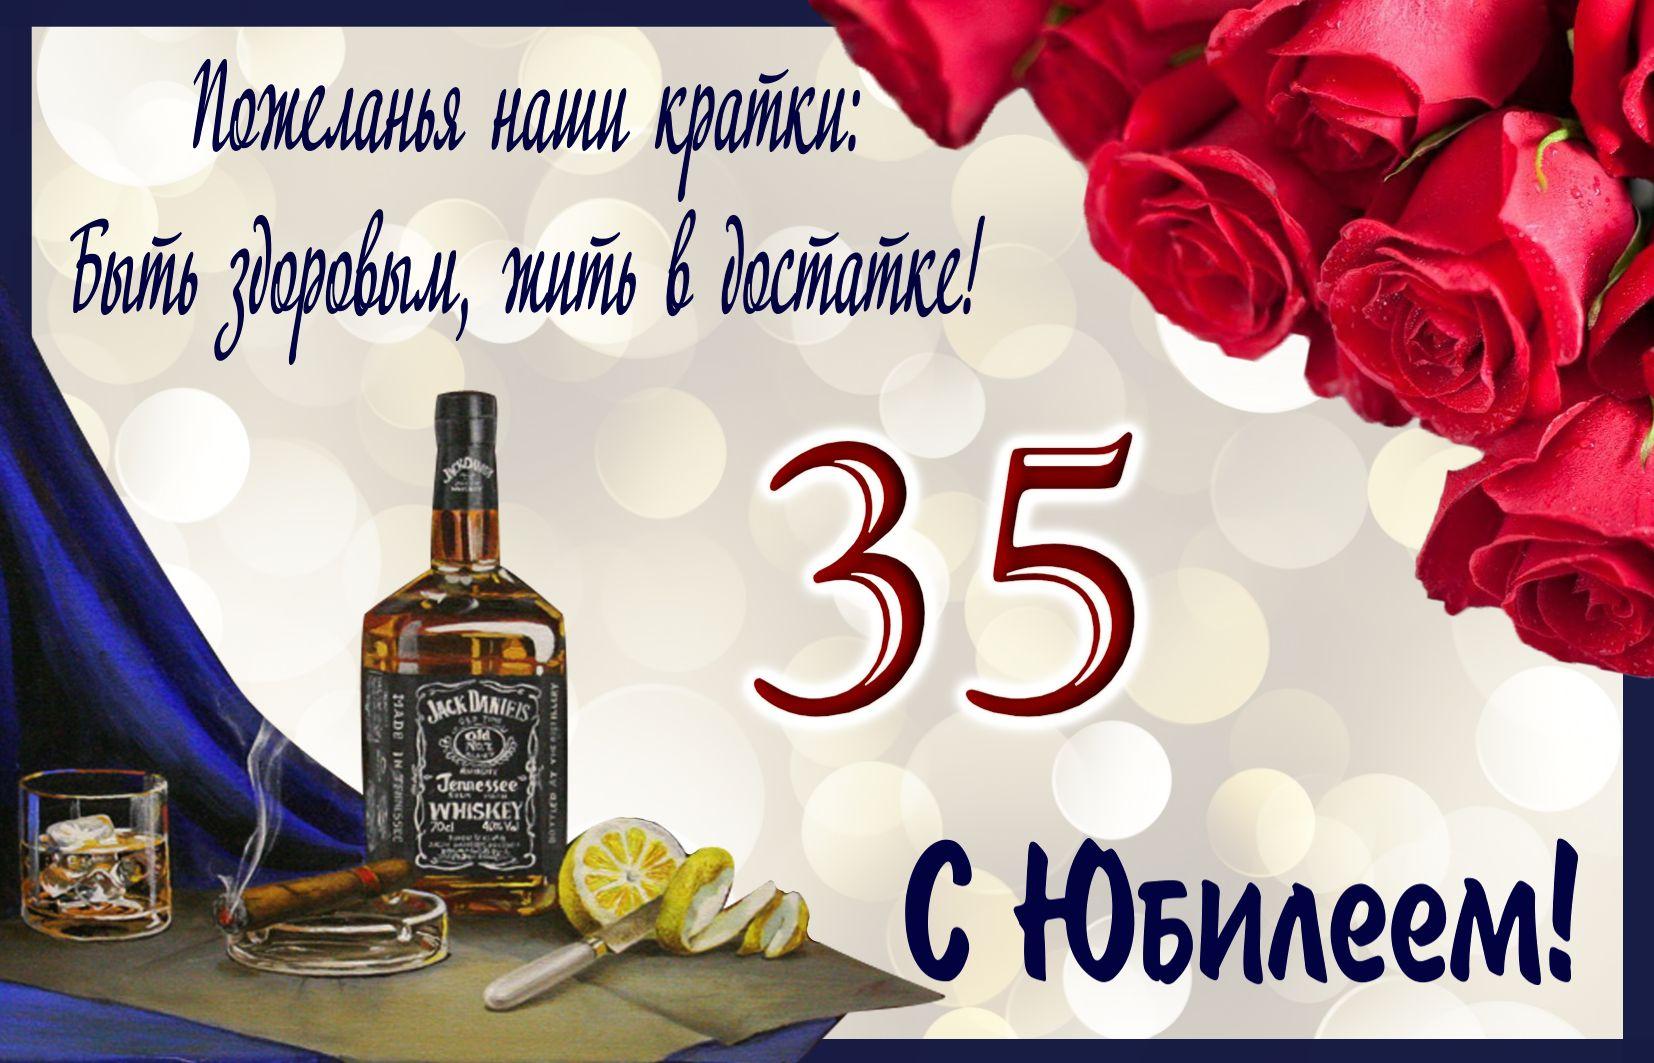 Открытка на 35 лет - виски с лимоном и сигара мужчине к юбилею